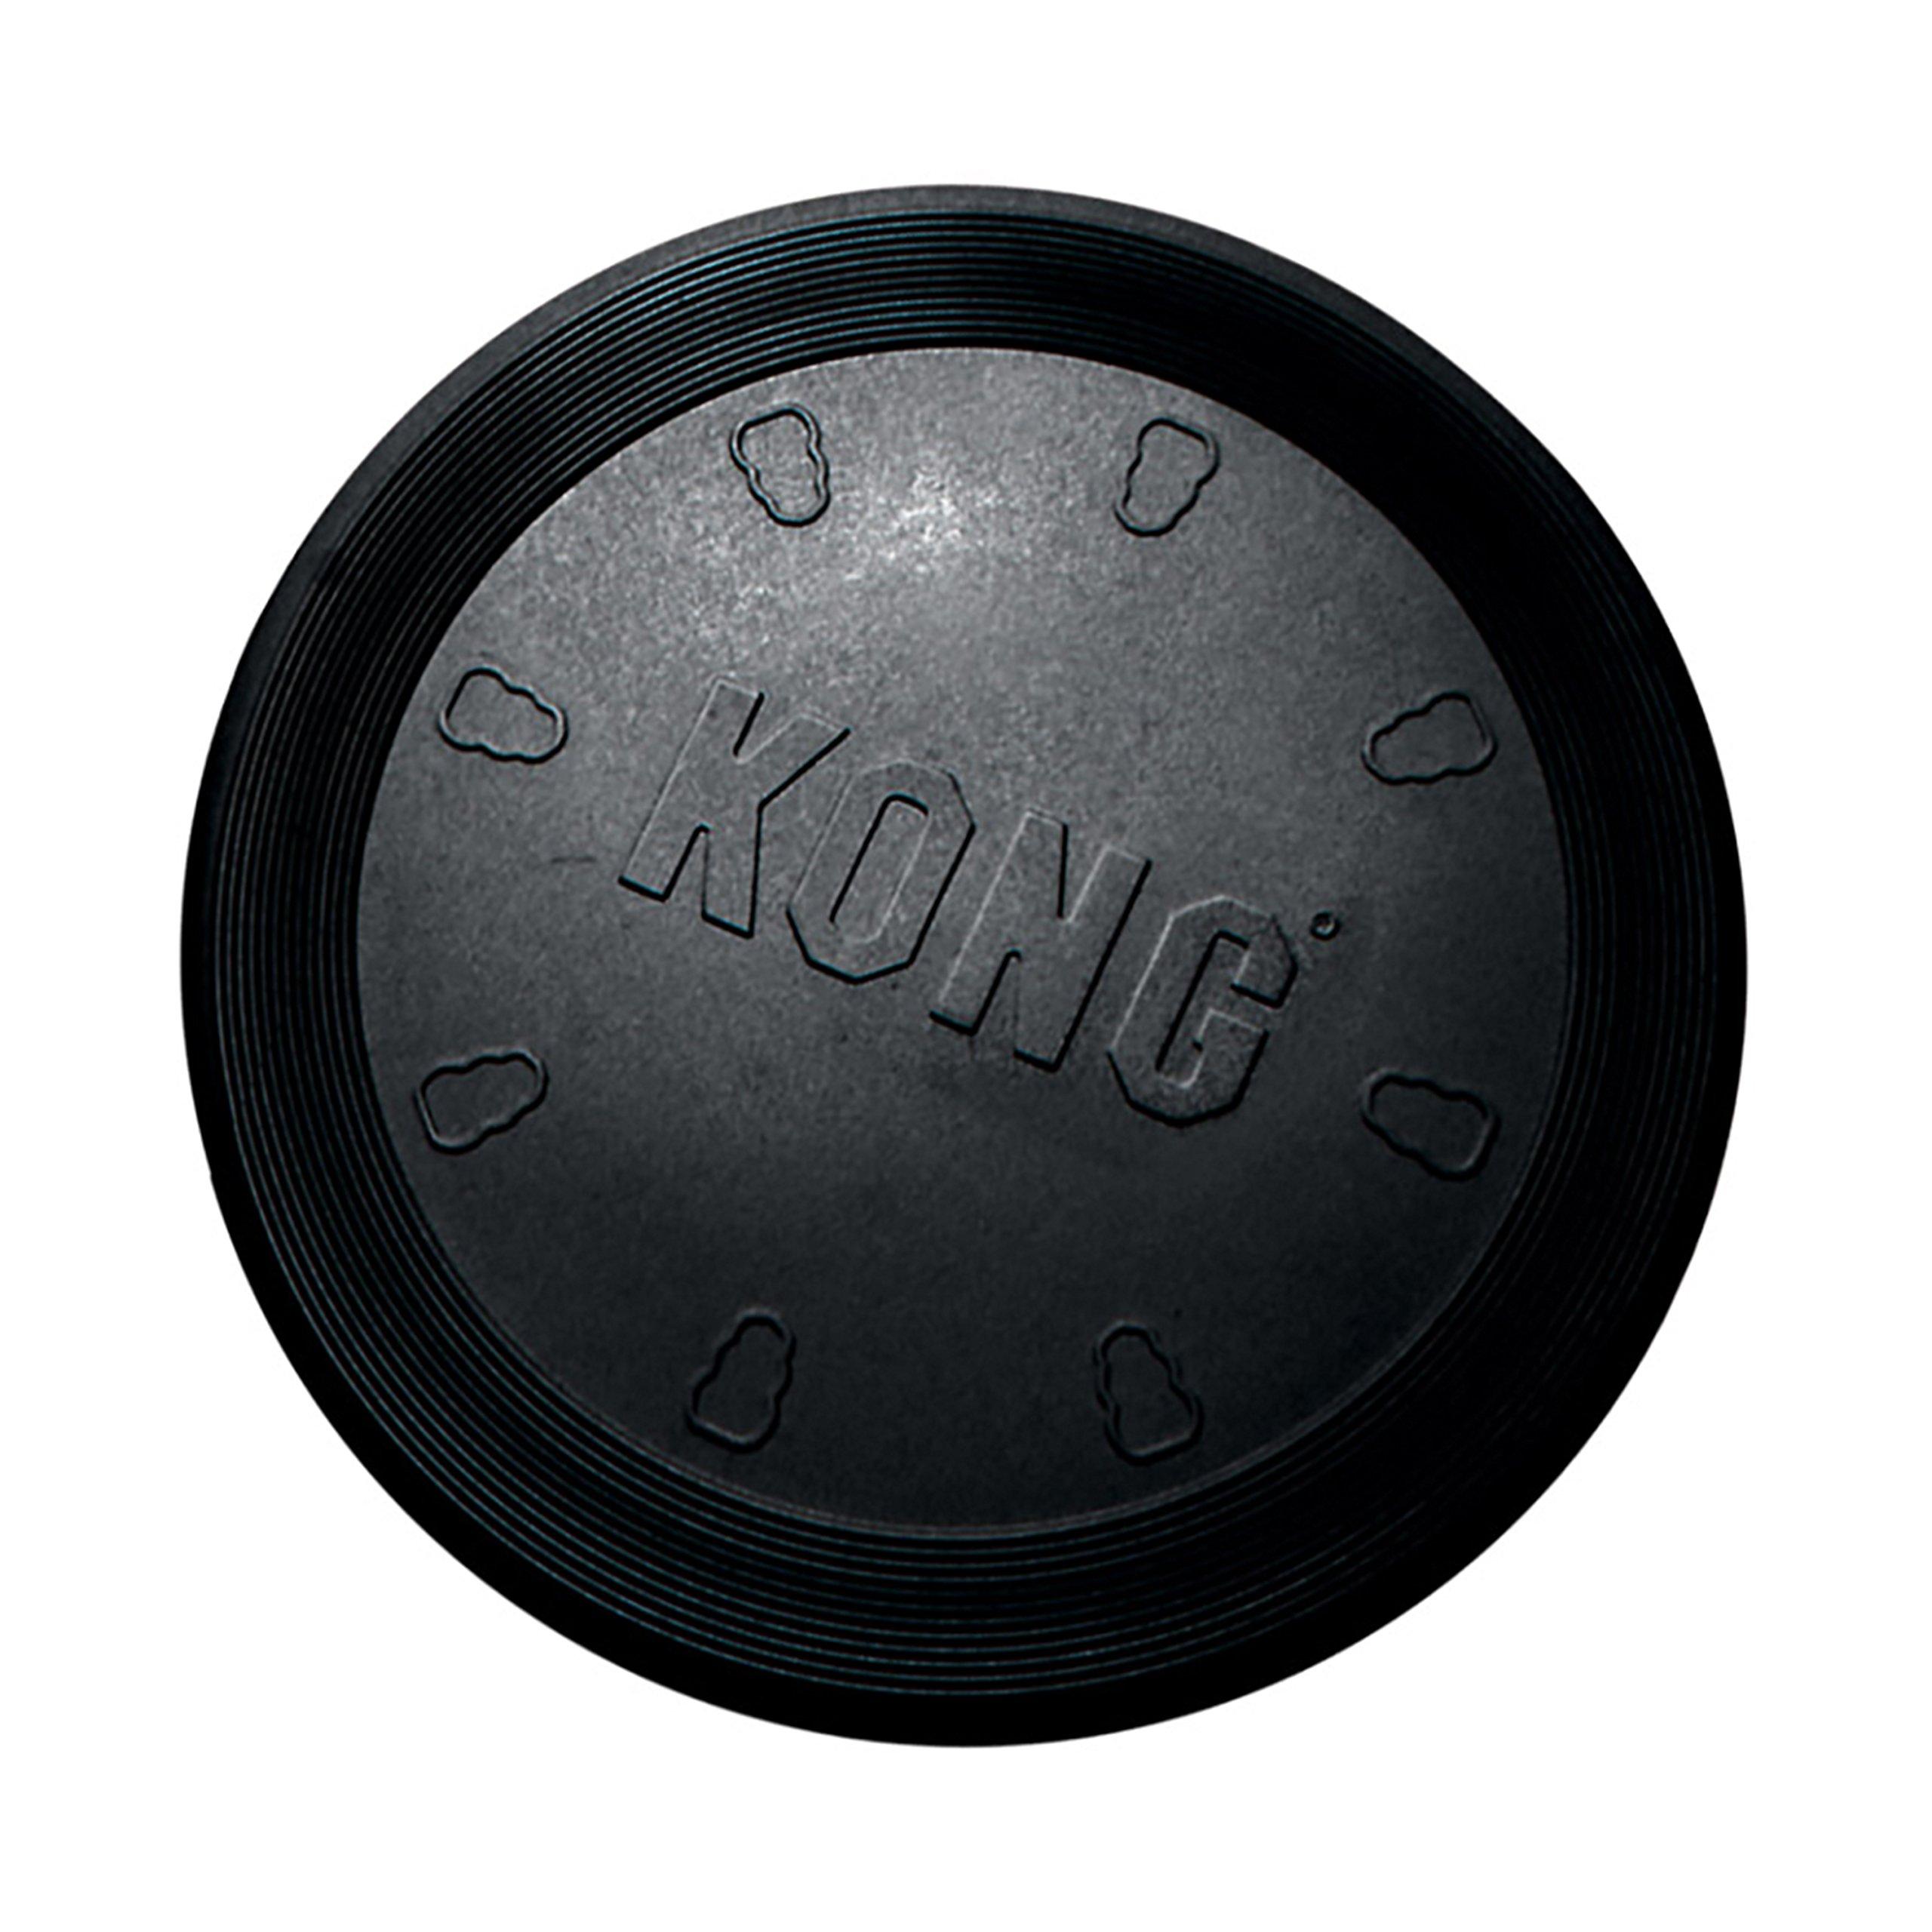 Kong Rubber Flyer, Large, Black Animal Dog Toys Frisbee Rubber Flexible Durable